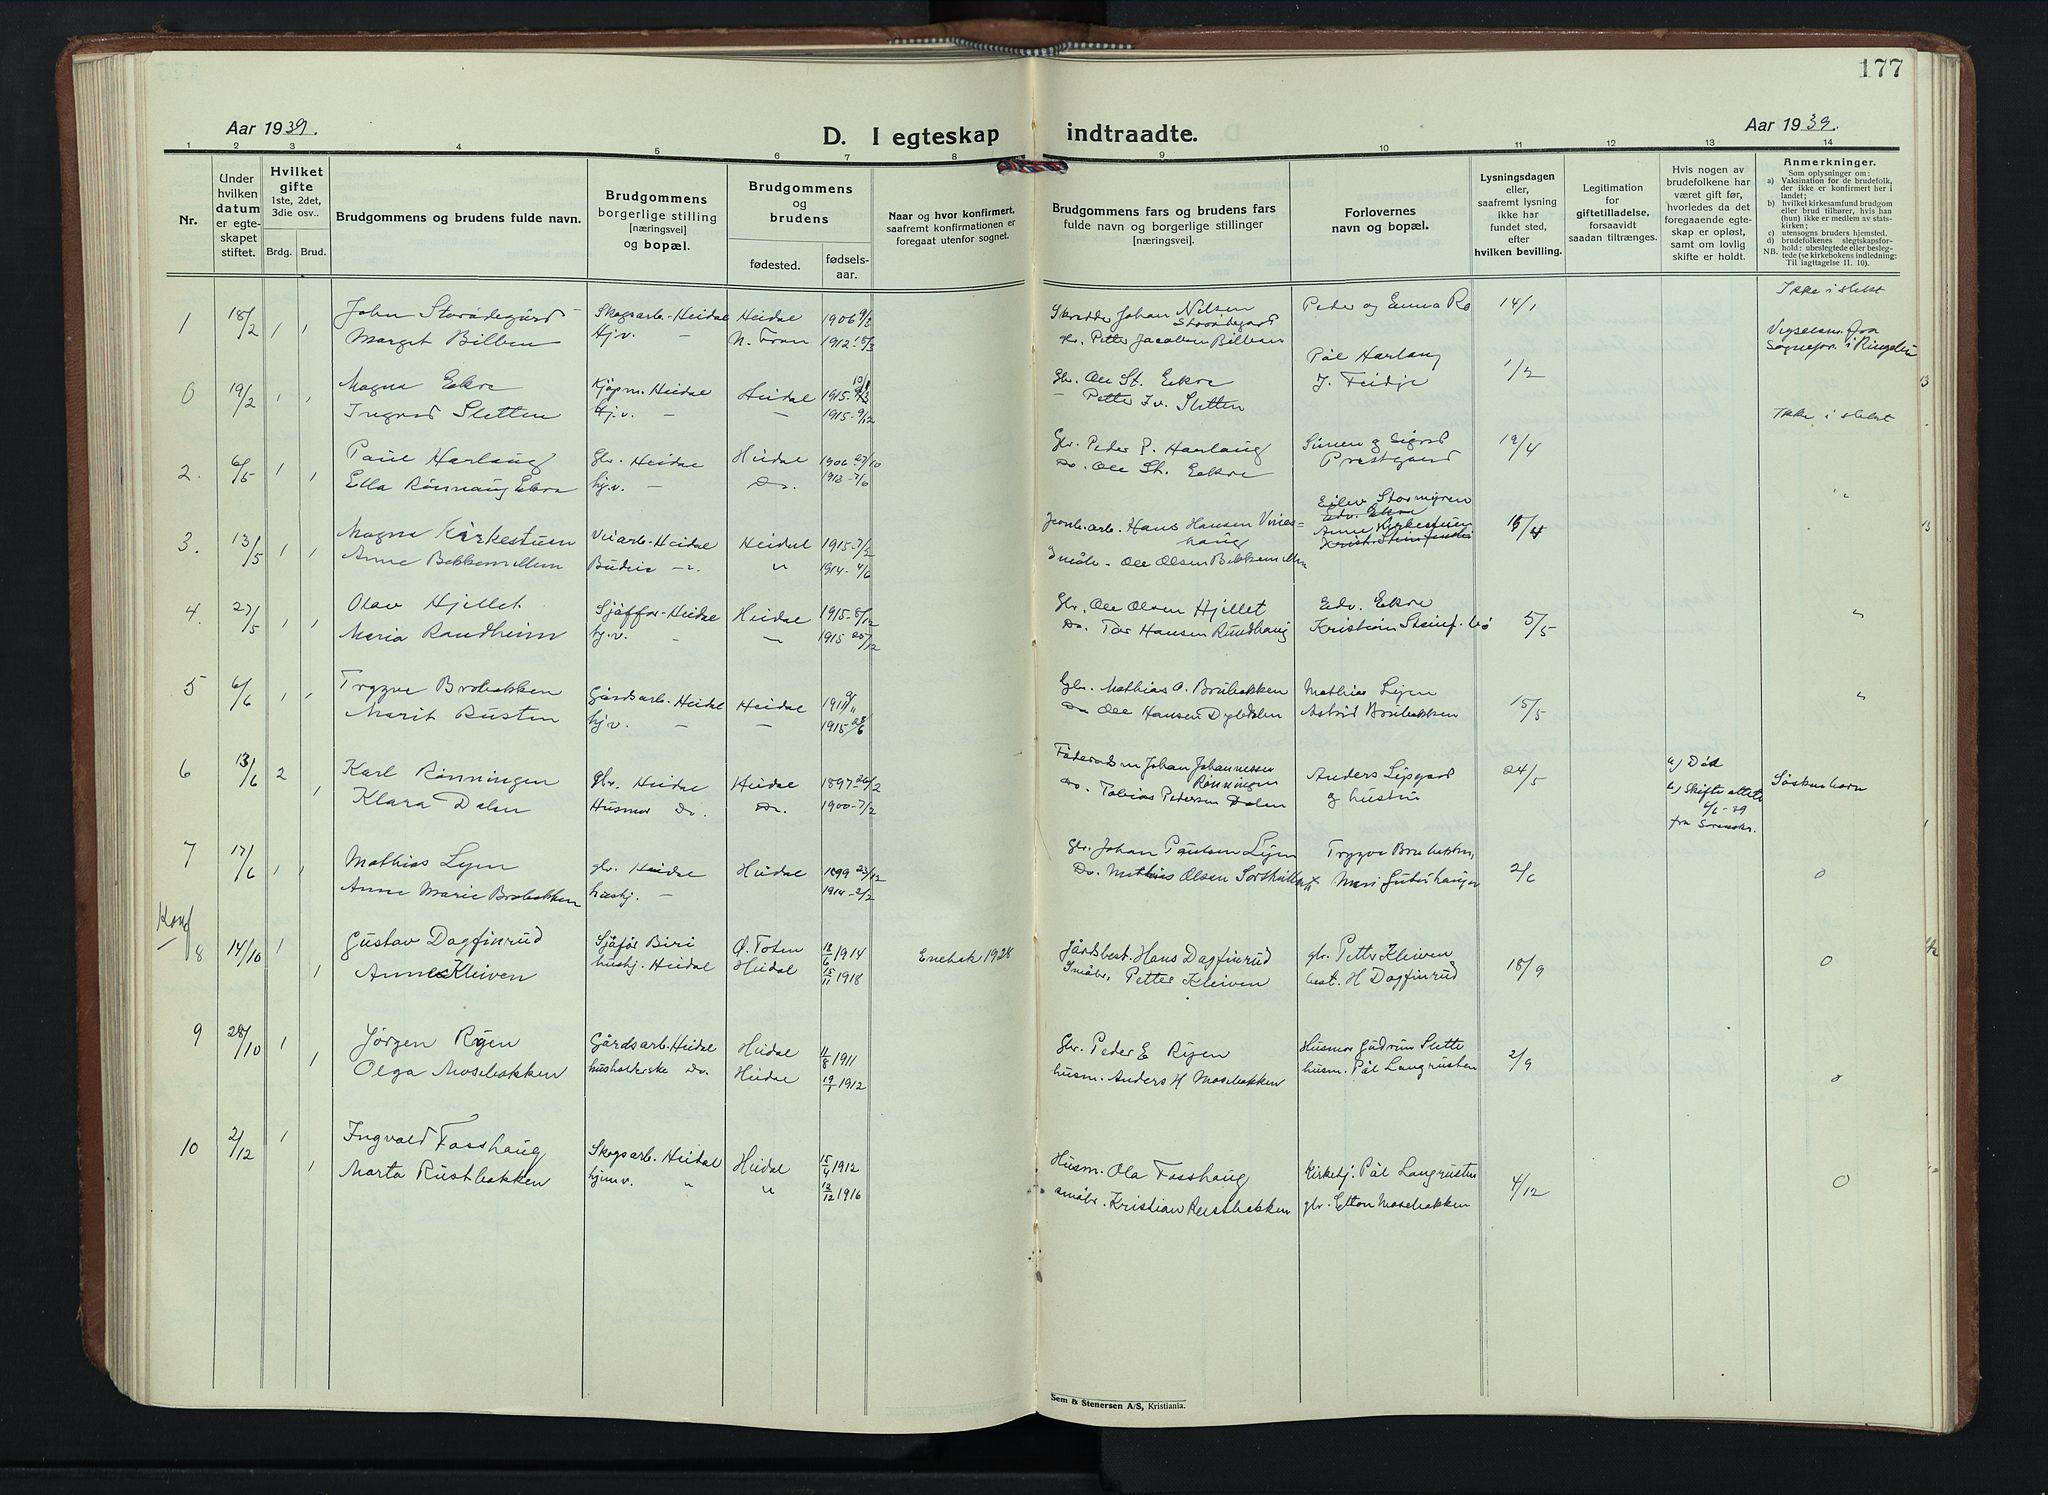 SAH, Sel prestekontor, Klokkerbok nr. 6, 1923-1953, s. 177